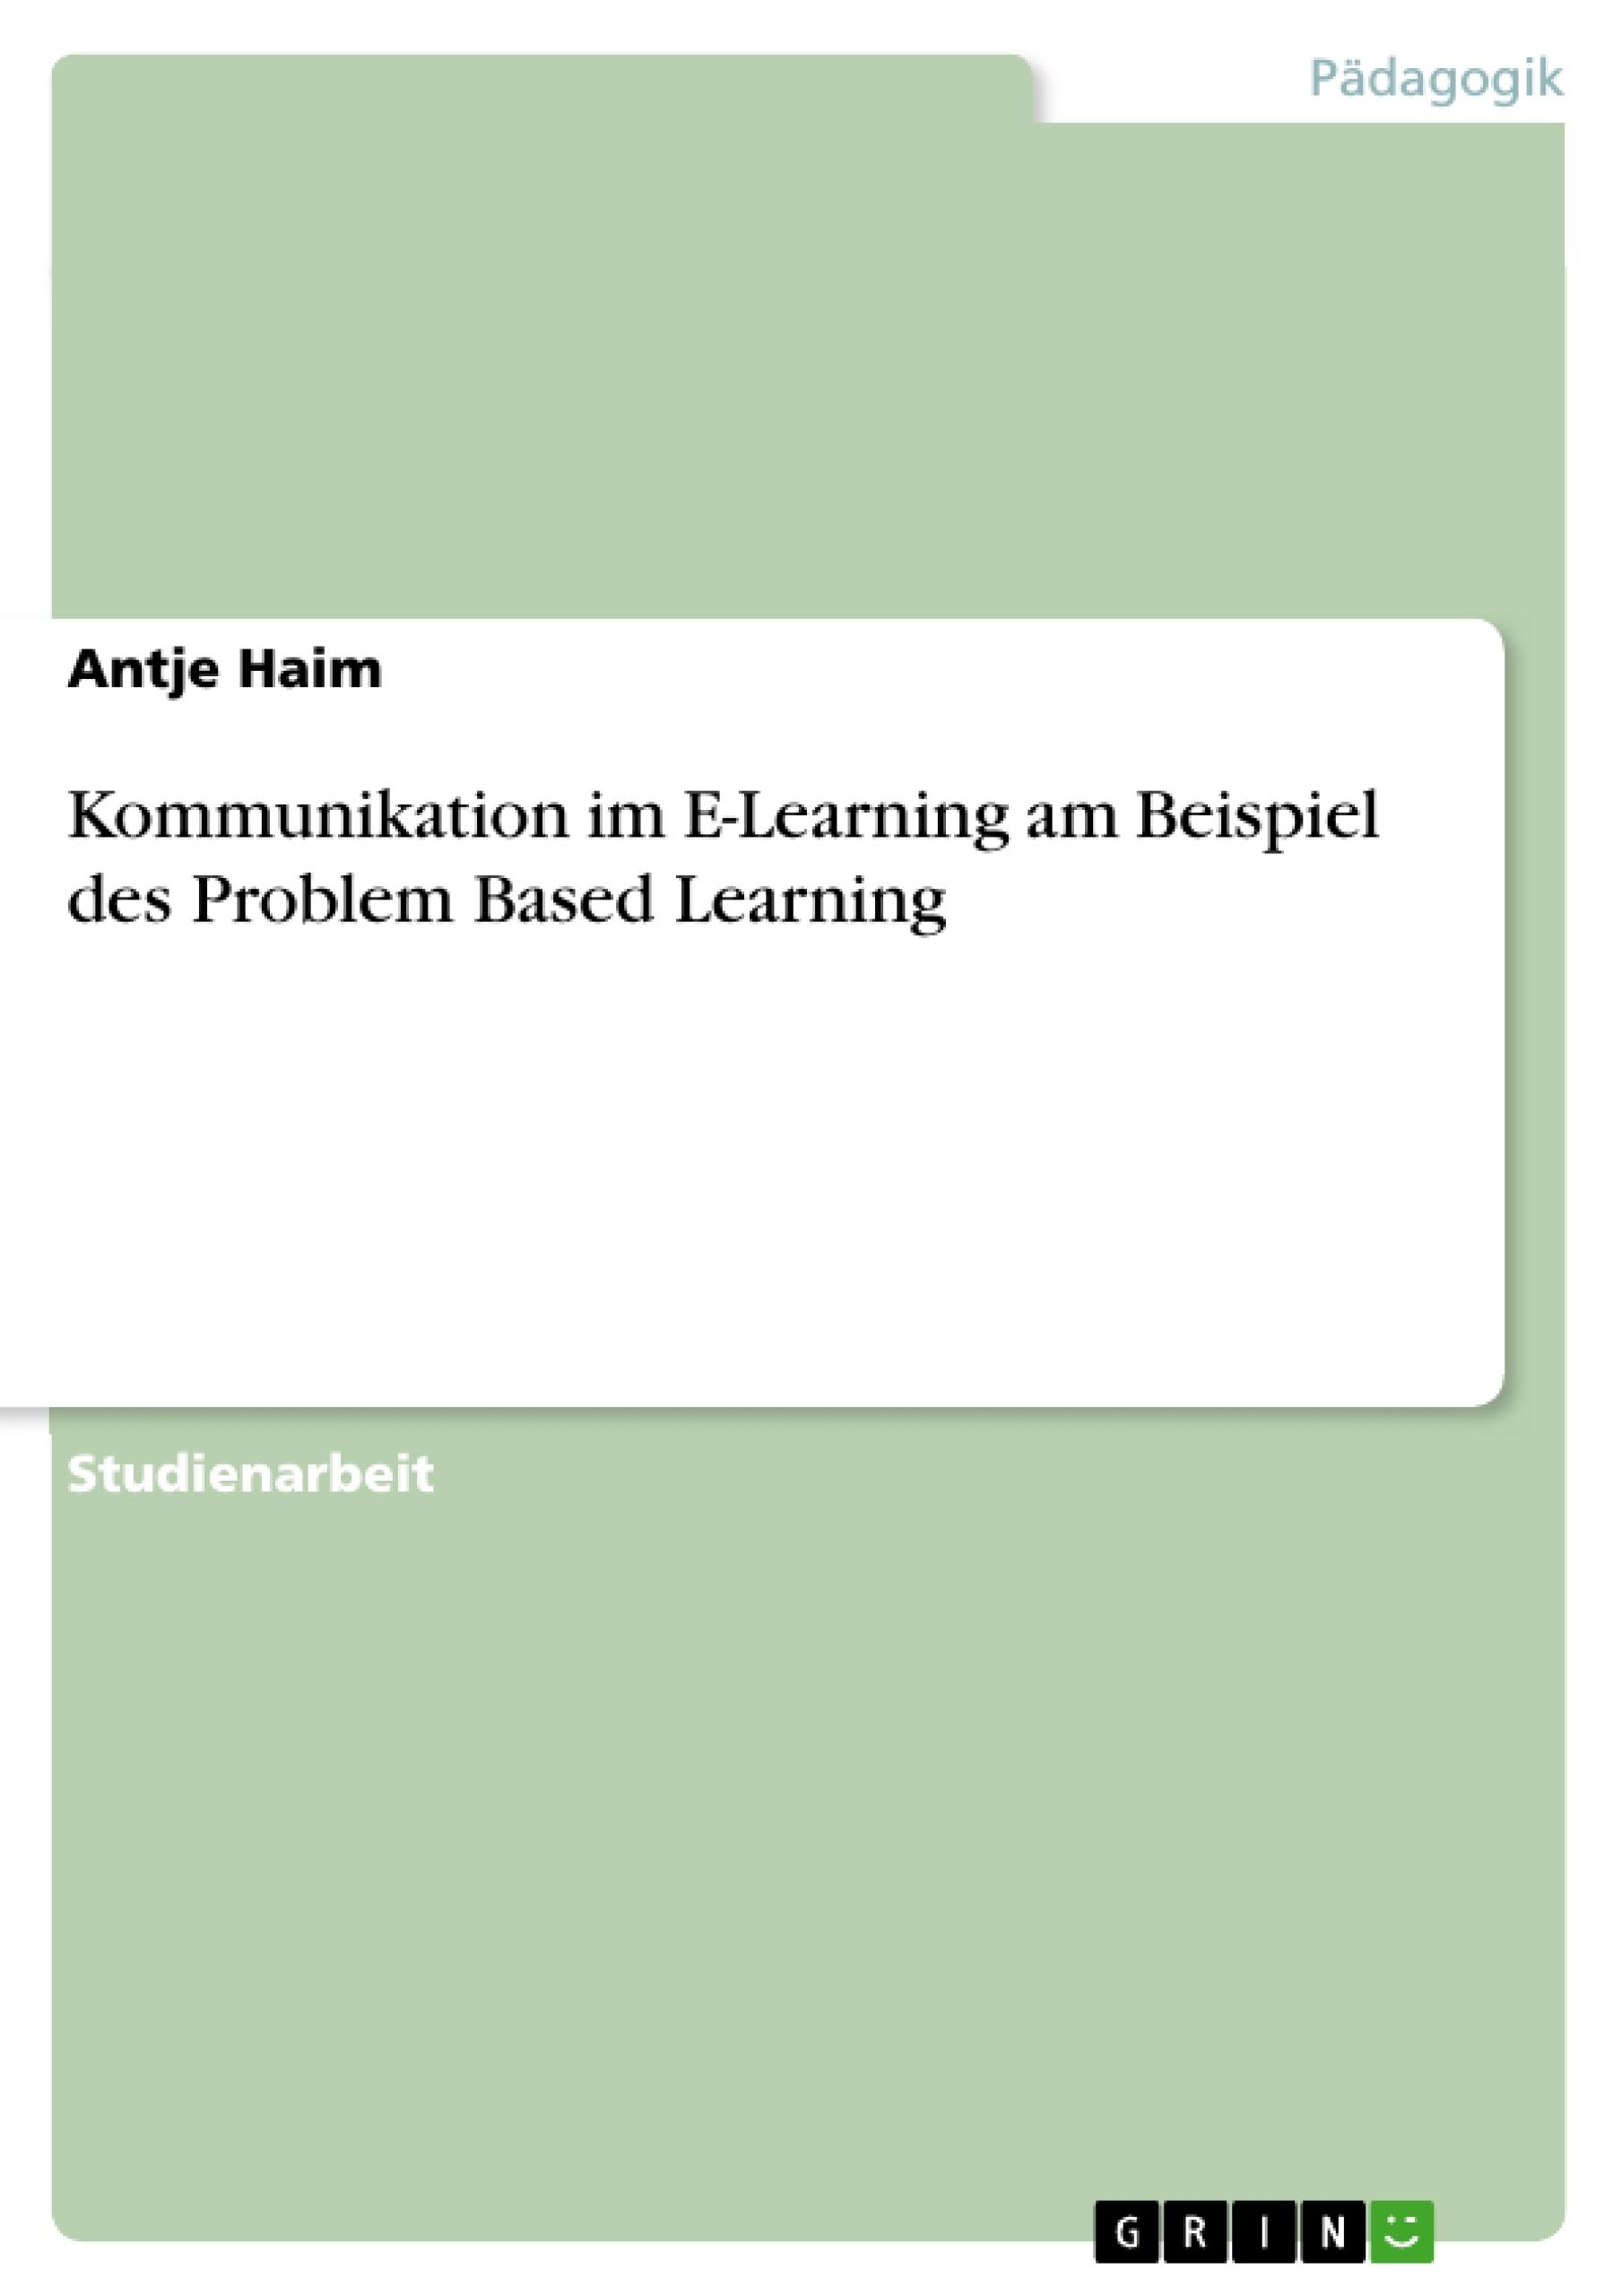 Titel: Kommunikation im E-Learning am Beispiel des Problem Based Learning